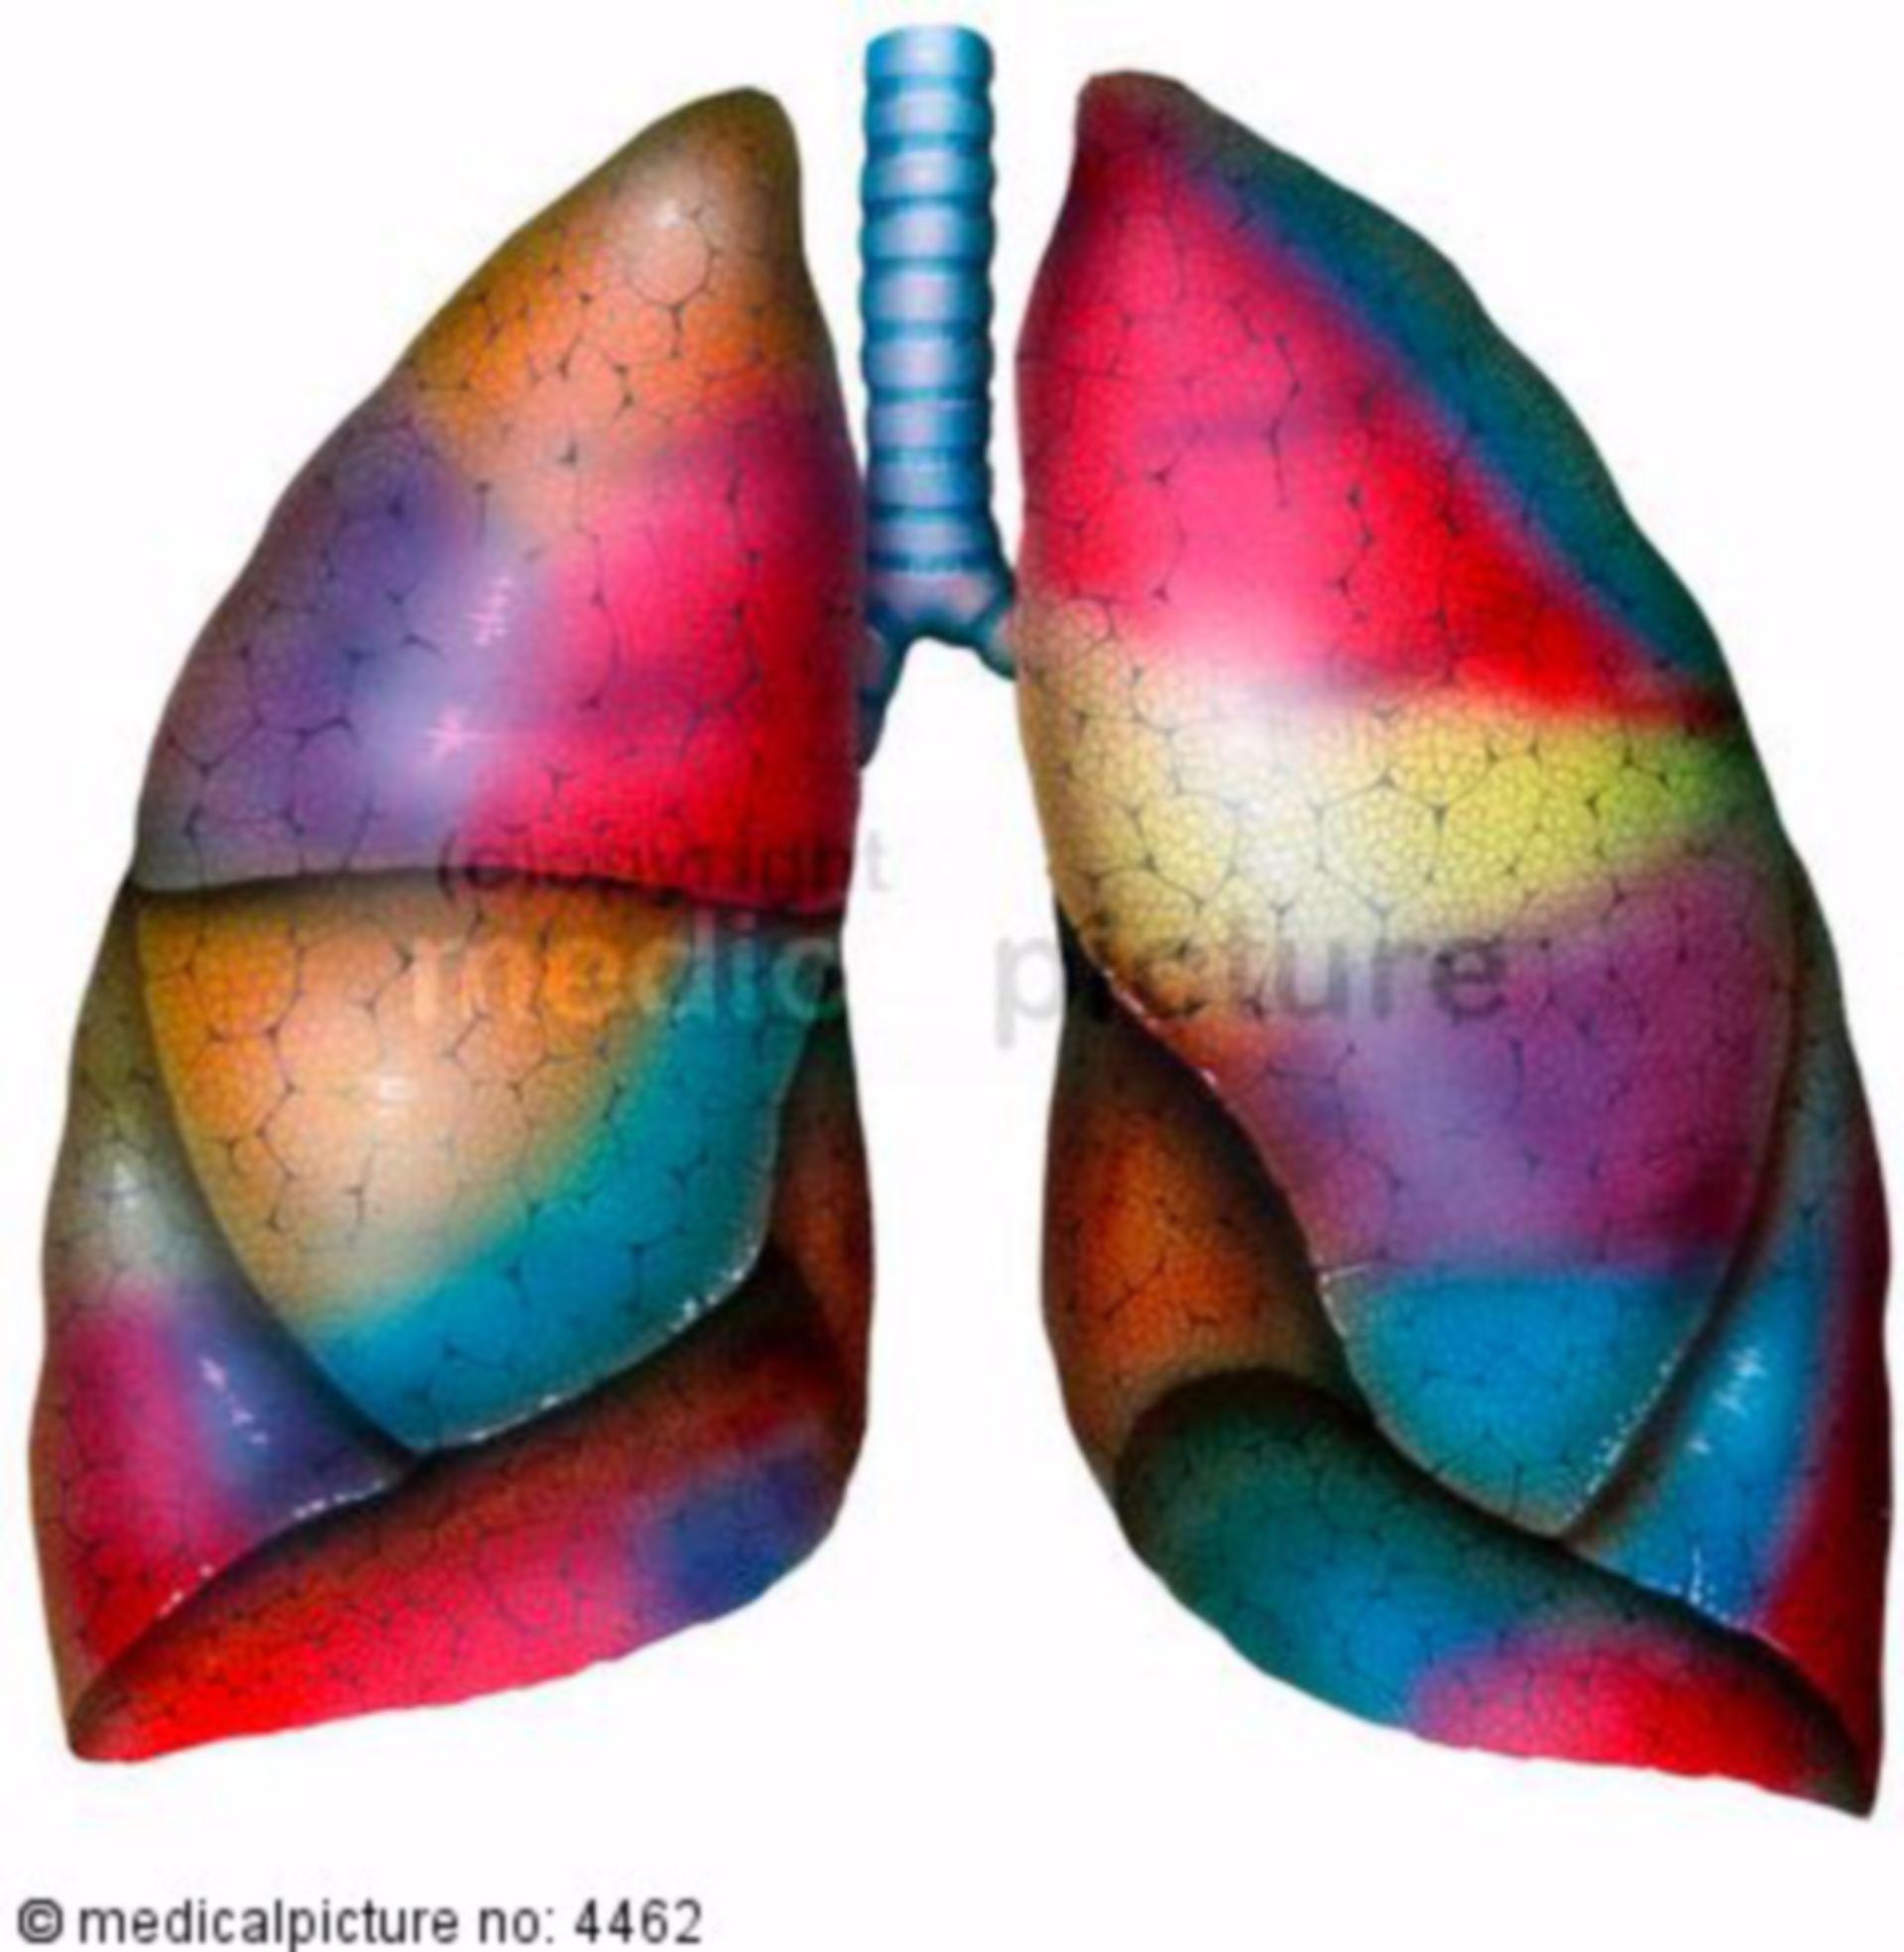 Segmented lung